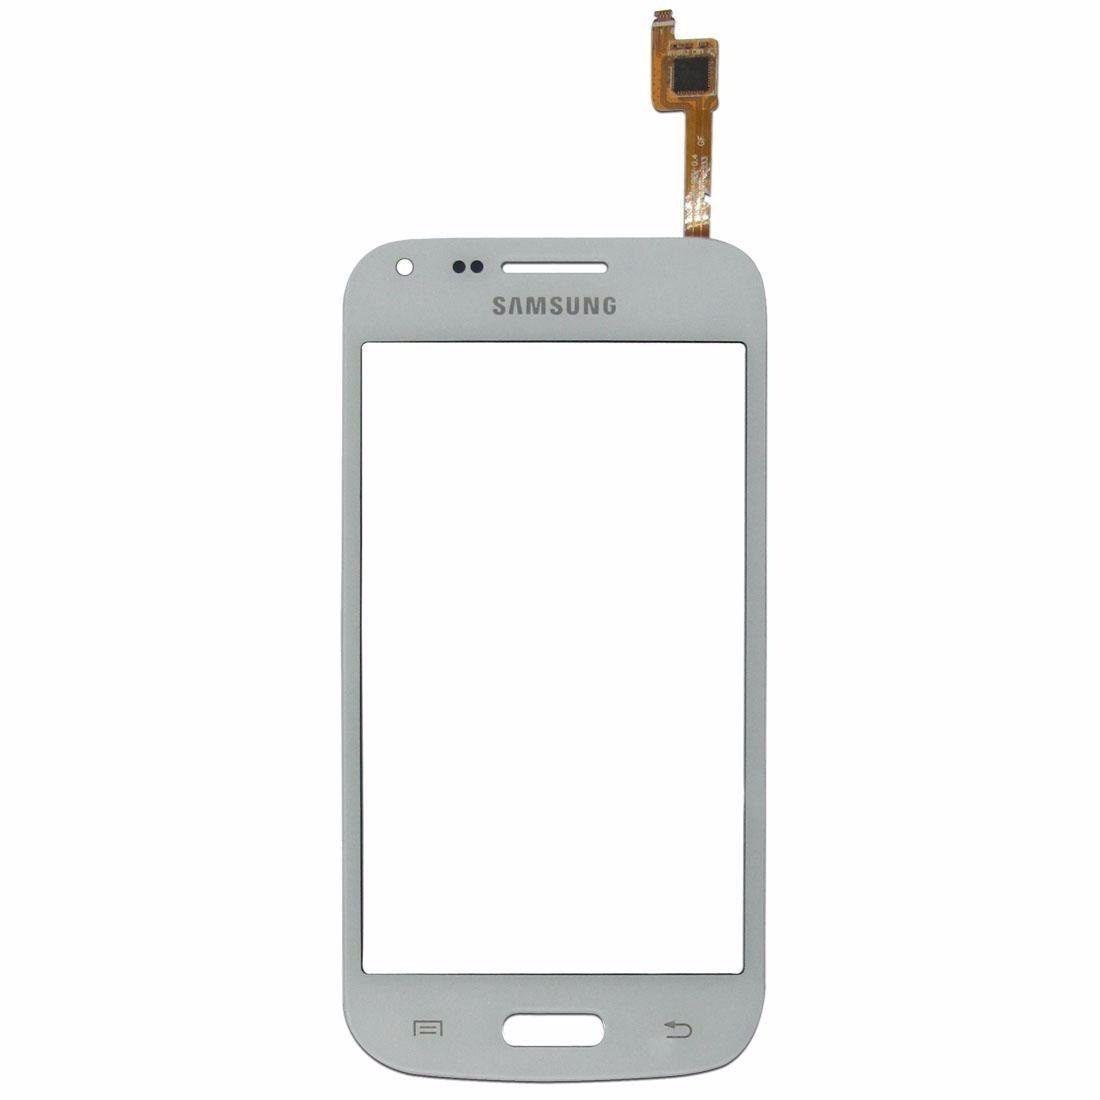 Tela Touch screen Frente   Samsung Galaxy Trend 3 Core Plus G3502 BRANCO